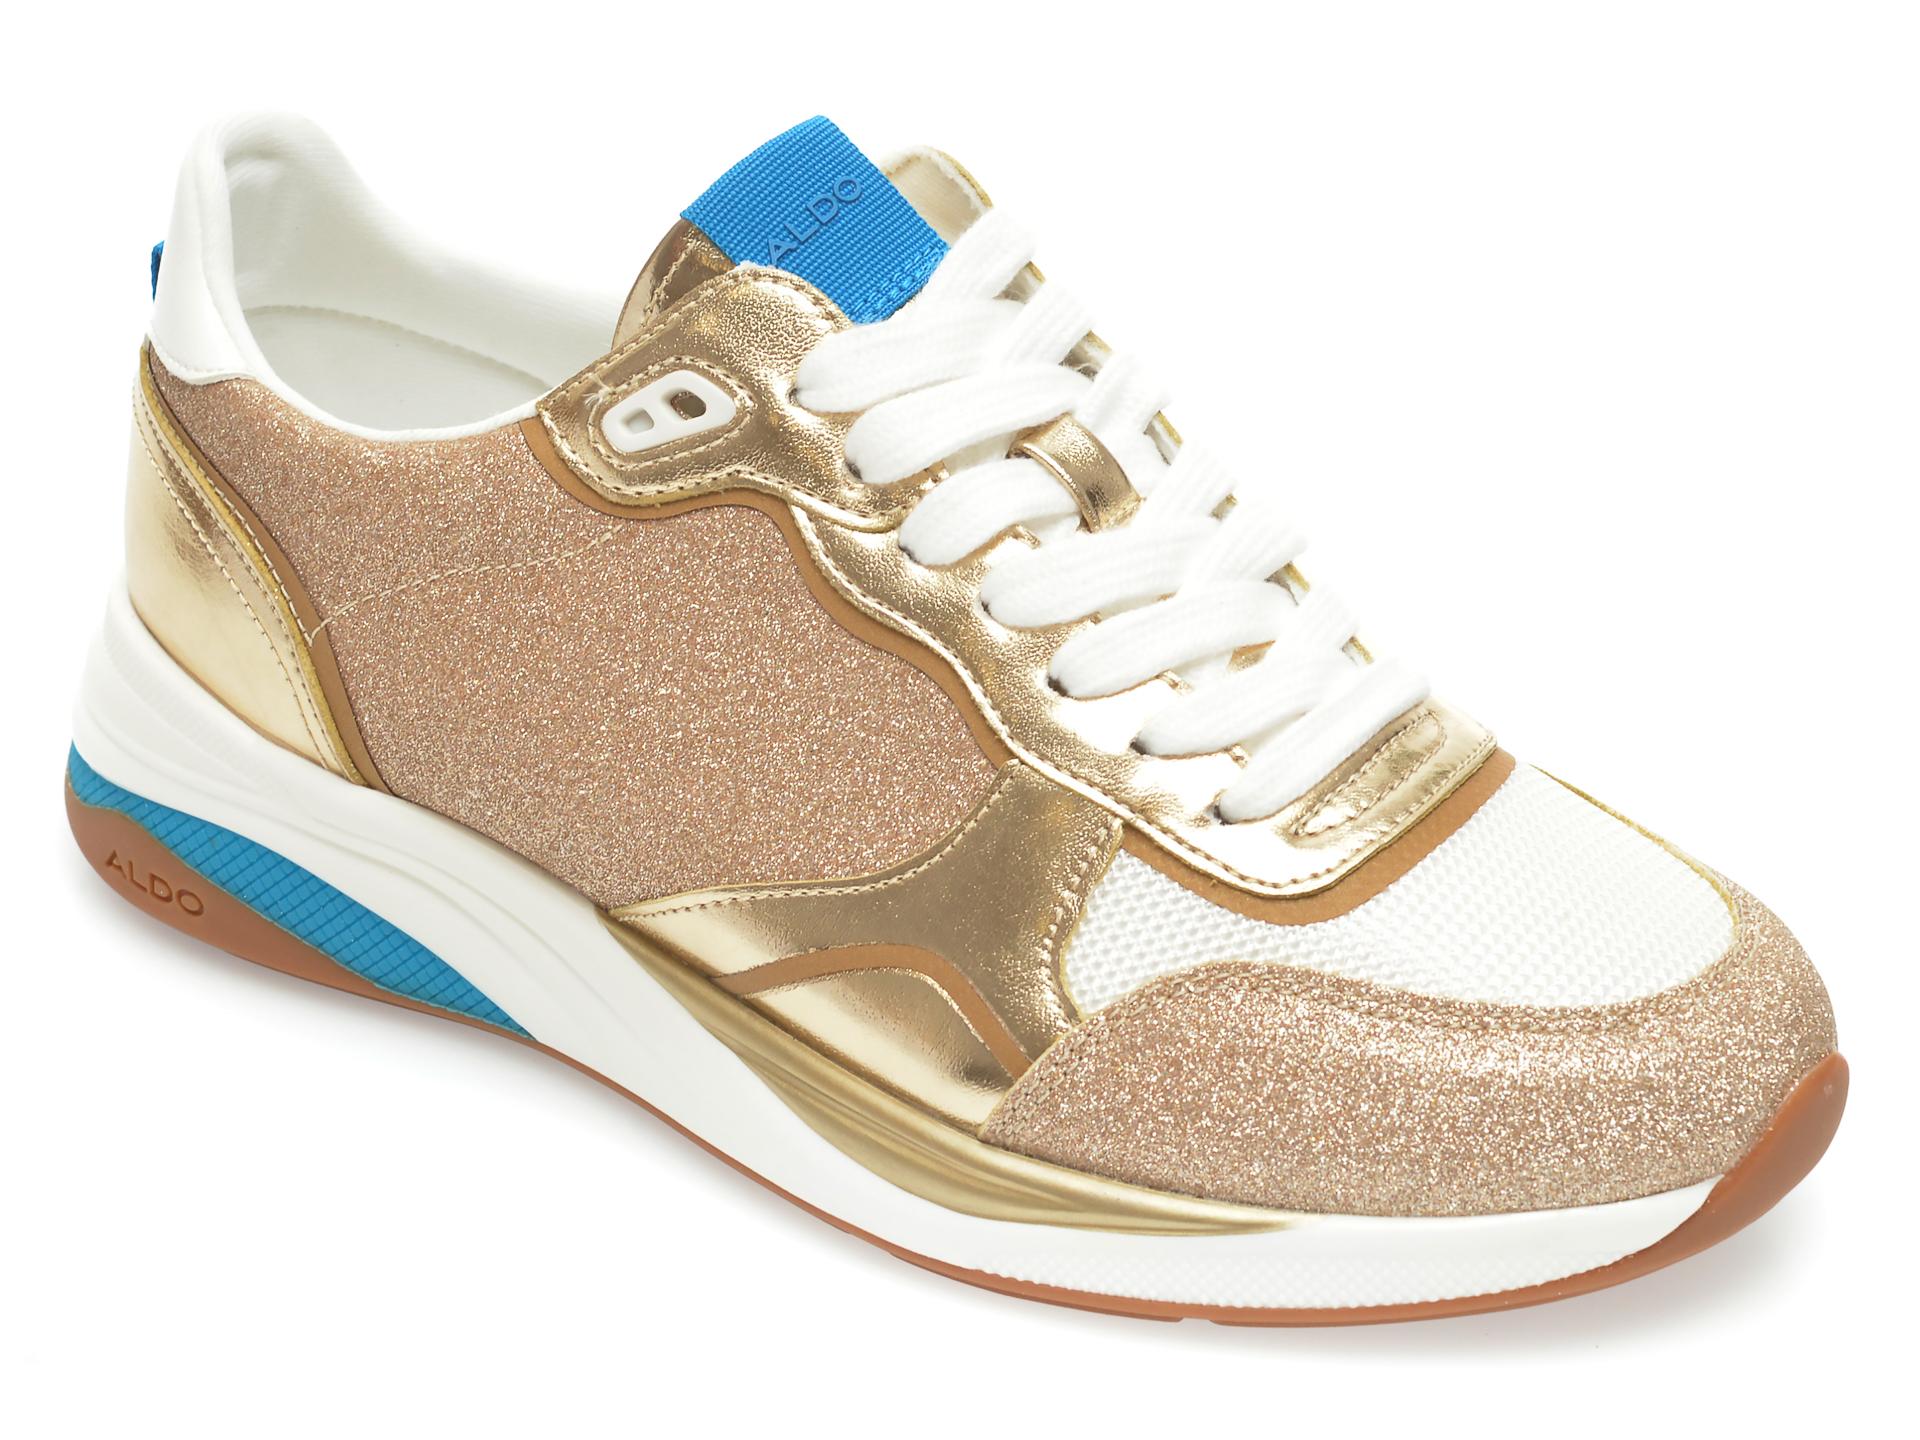 Pantofi sport ALDO aurii, Makenna710, din piele ecologica New